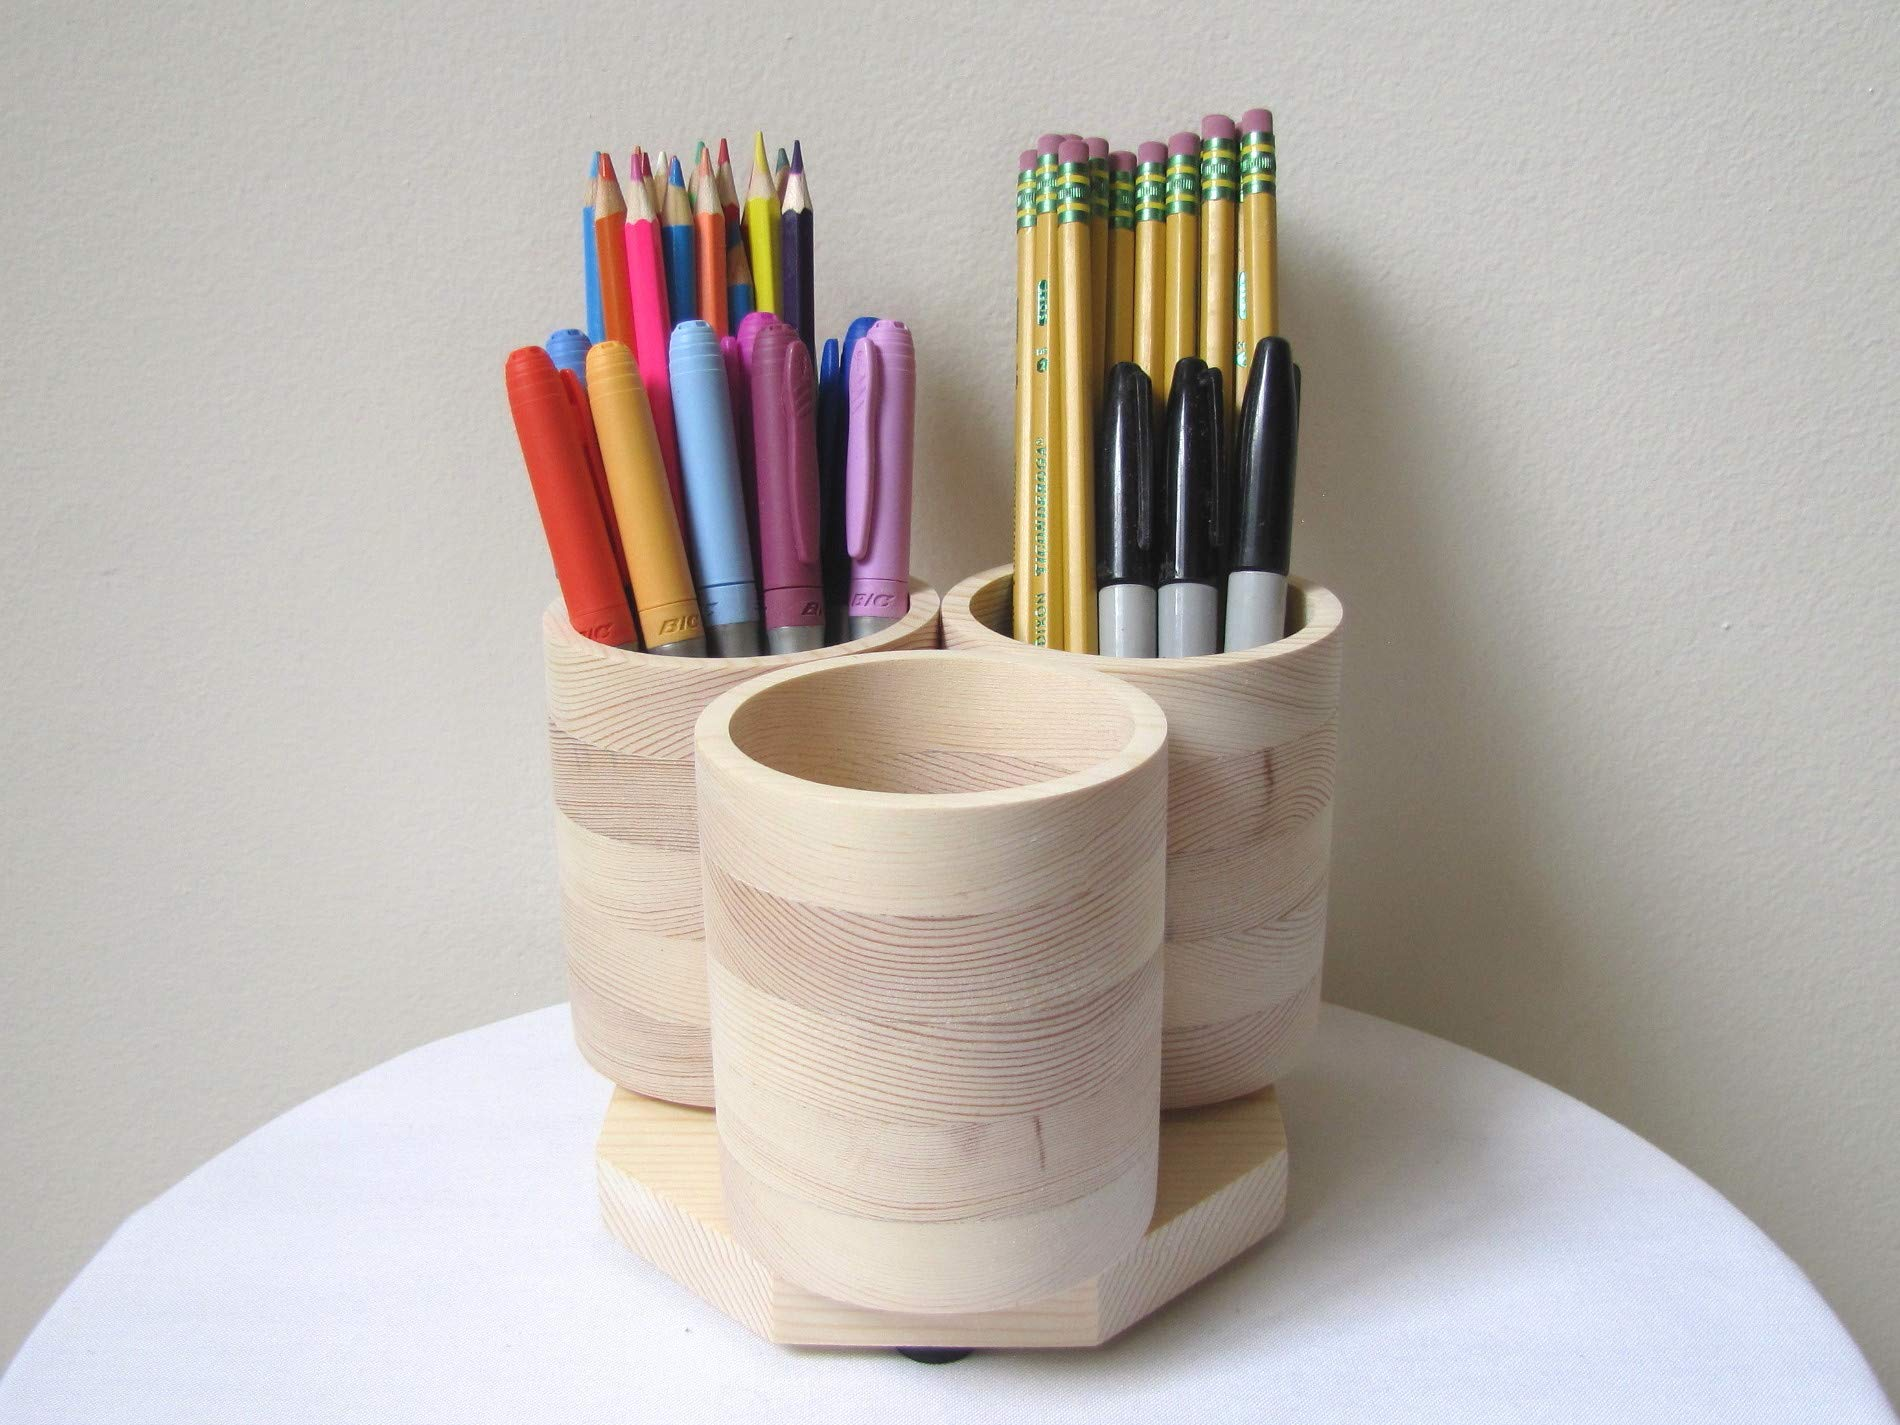 3 Cup Desktop Rotating Wooden Pencil Holder Desk Organizer Marker Storage, Holds 75+ Colored Pencils Pens Markers, Natural Wood by Craft Innovation